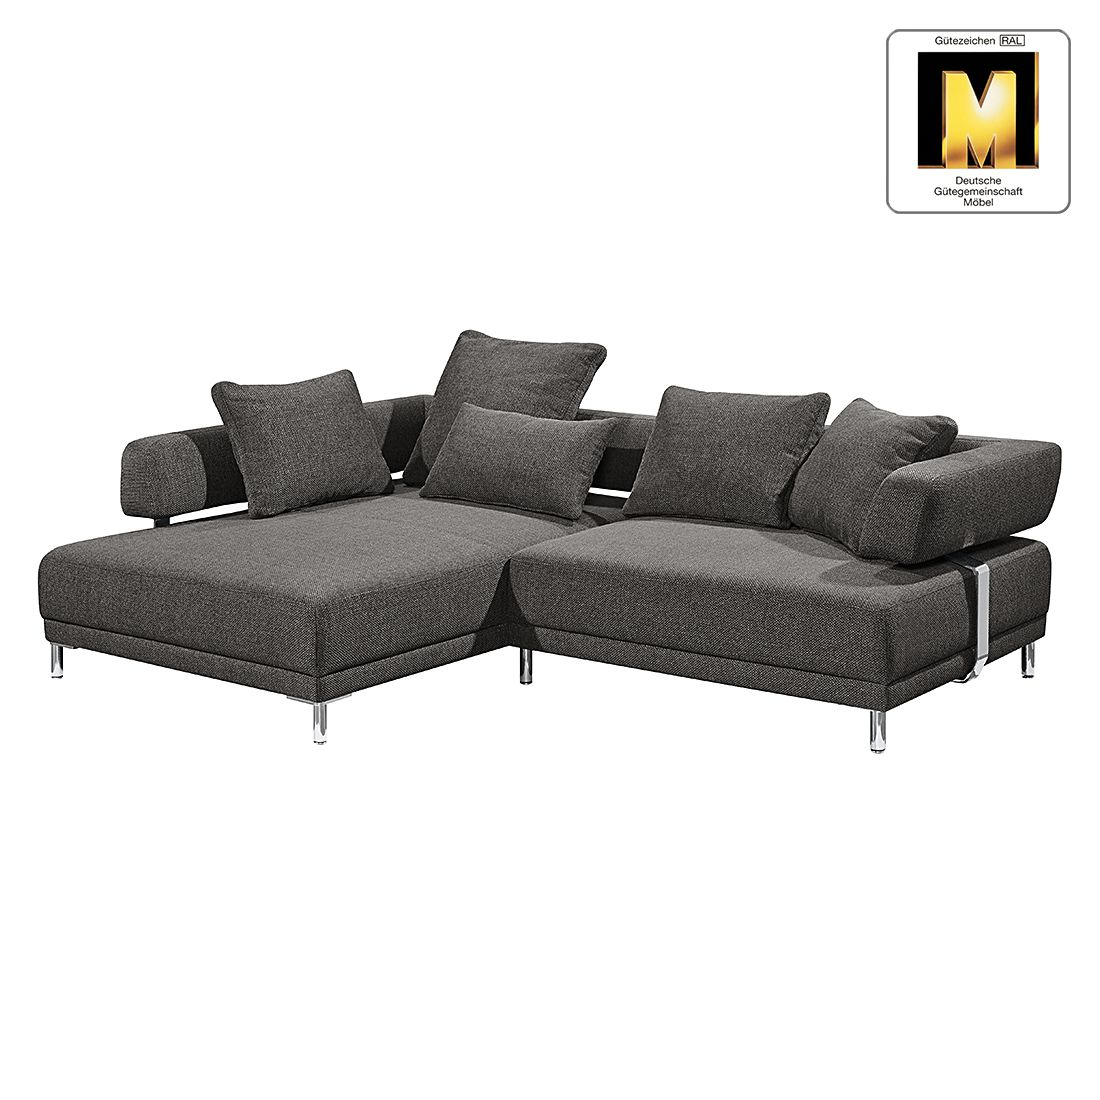 ecksofa casual line ii strukturstoff longchair ottomane davorstehend links manueller. Black Bedroom Furniture Sets. Home Design Ideas